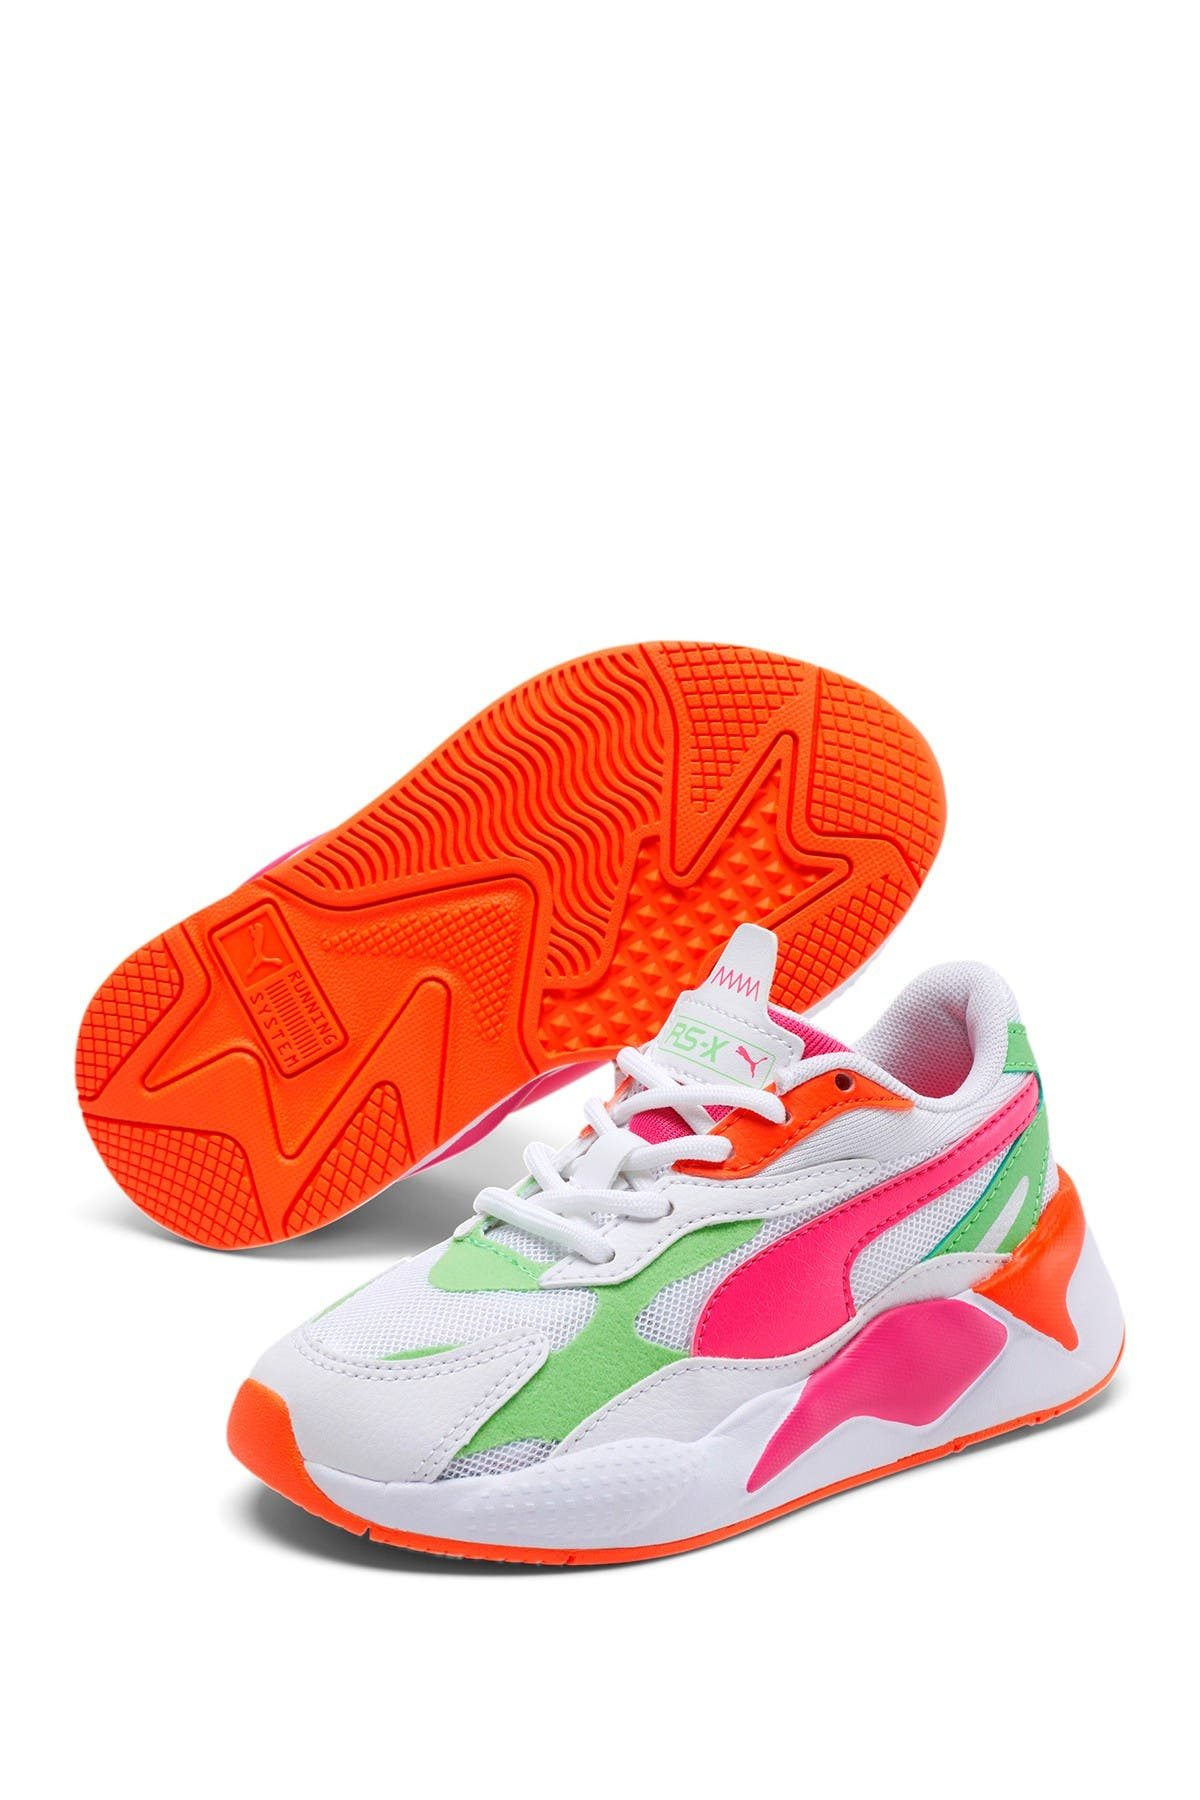 Image of PUMA RS-X Crazy Sneaker